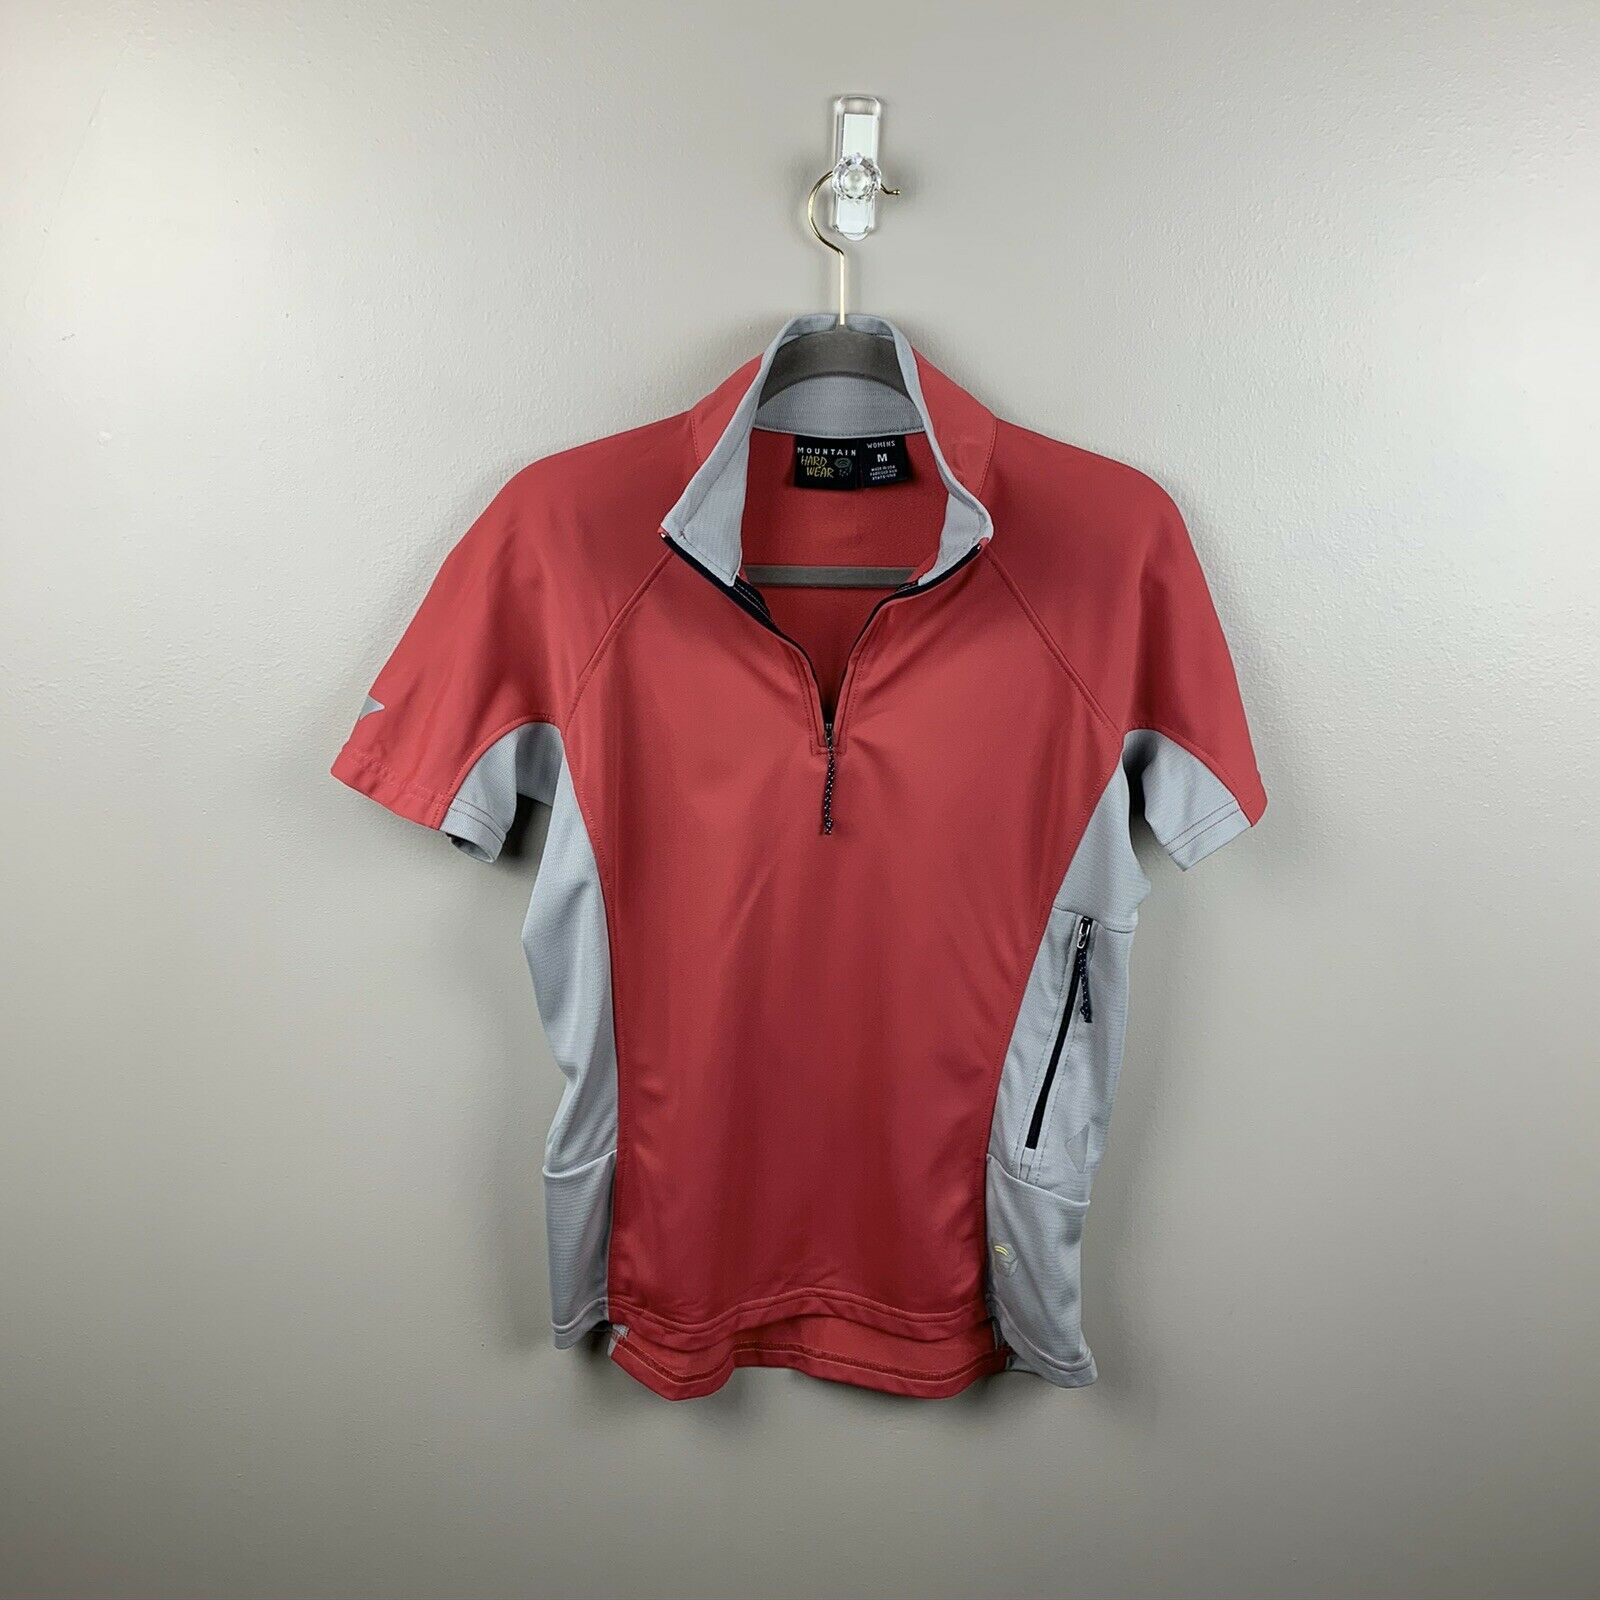 Mountain Hardwear Women's Short Sleeve Half Zip Cycling Top Red Gray